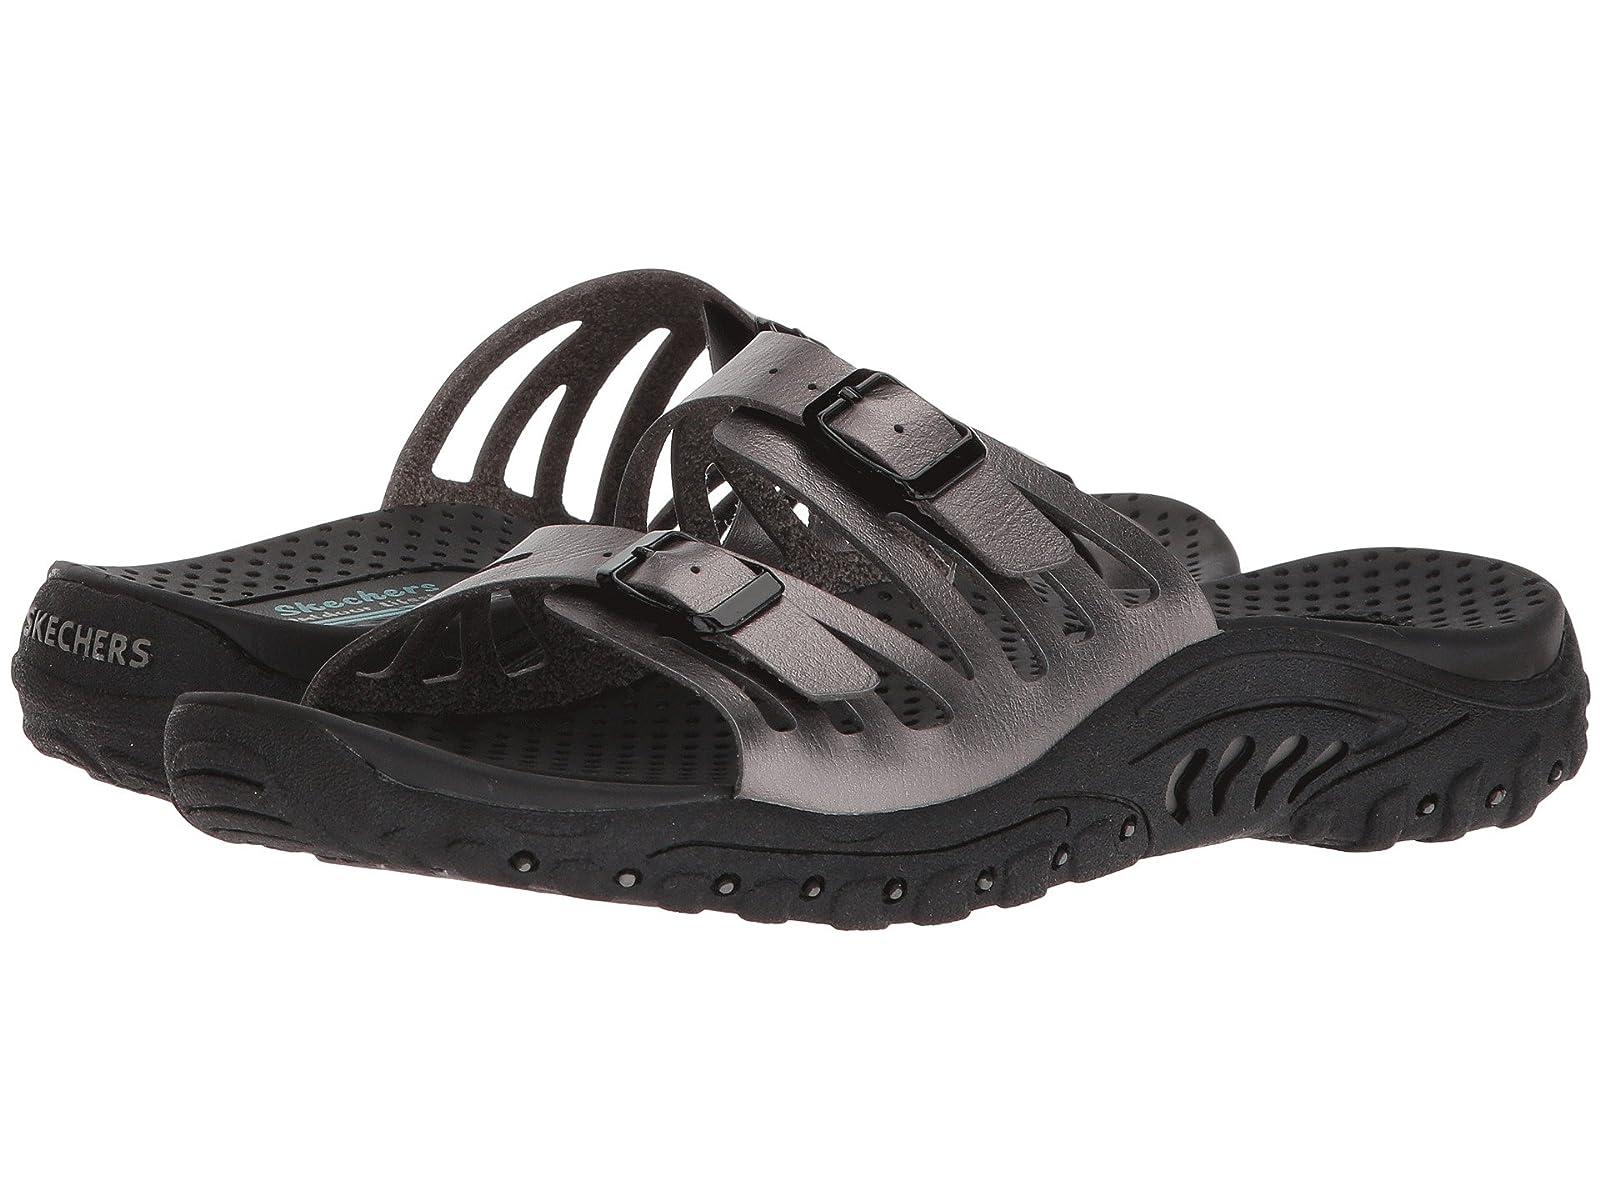 SKECHERS ReggaeAtmospheric grades have affordable shoes